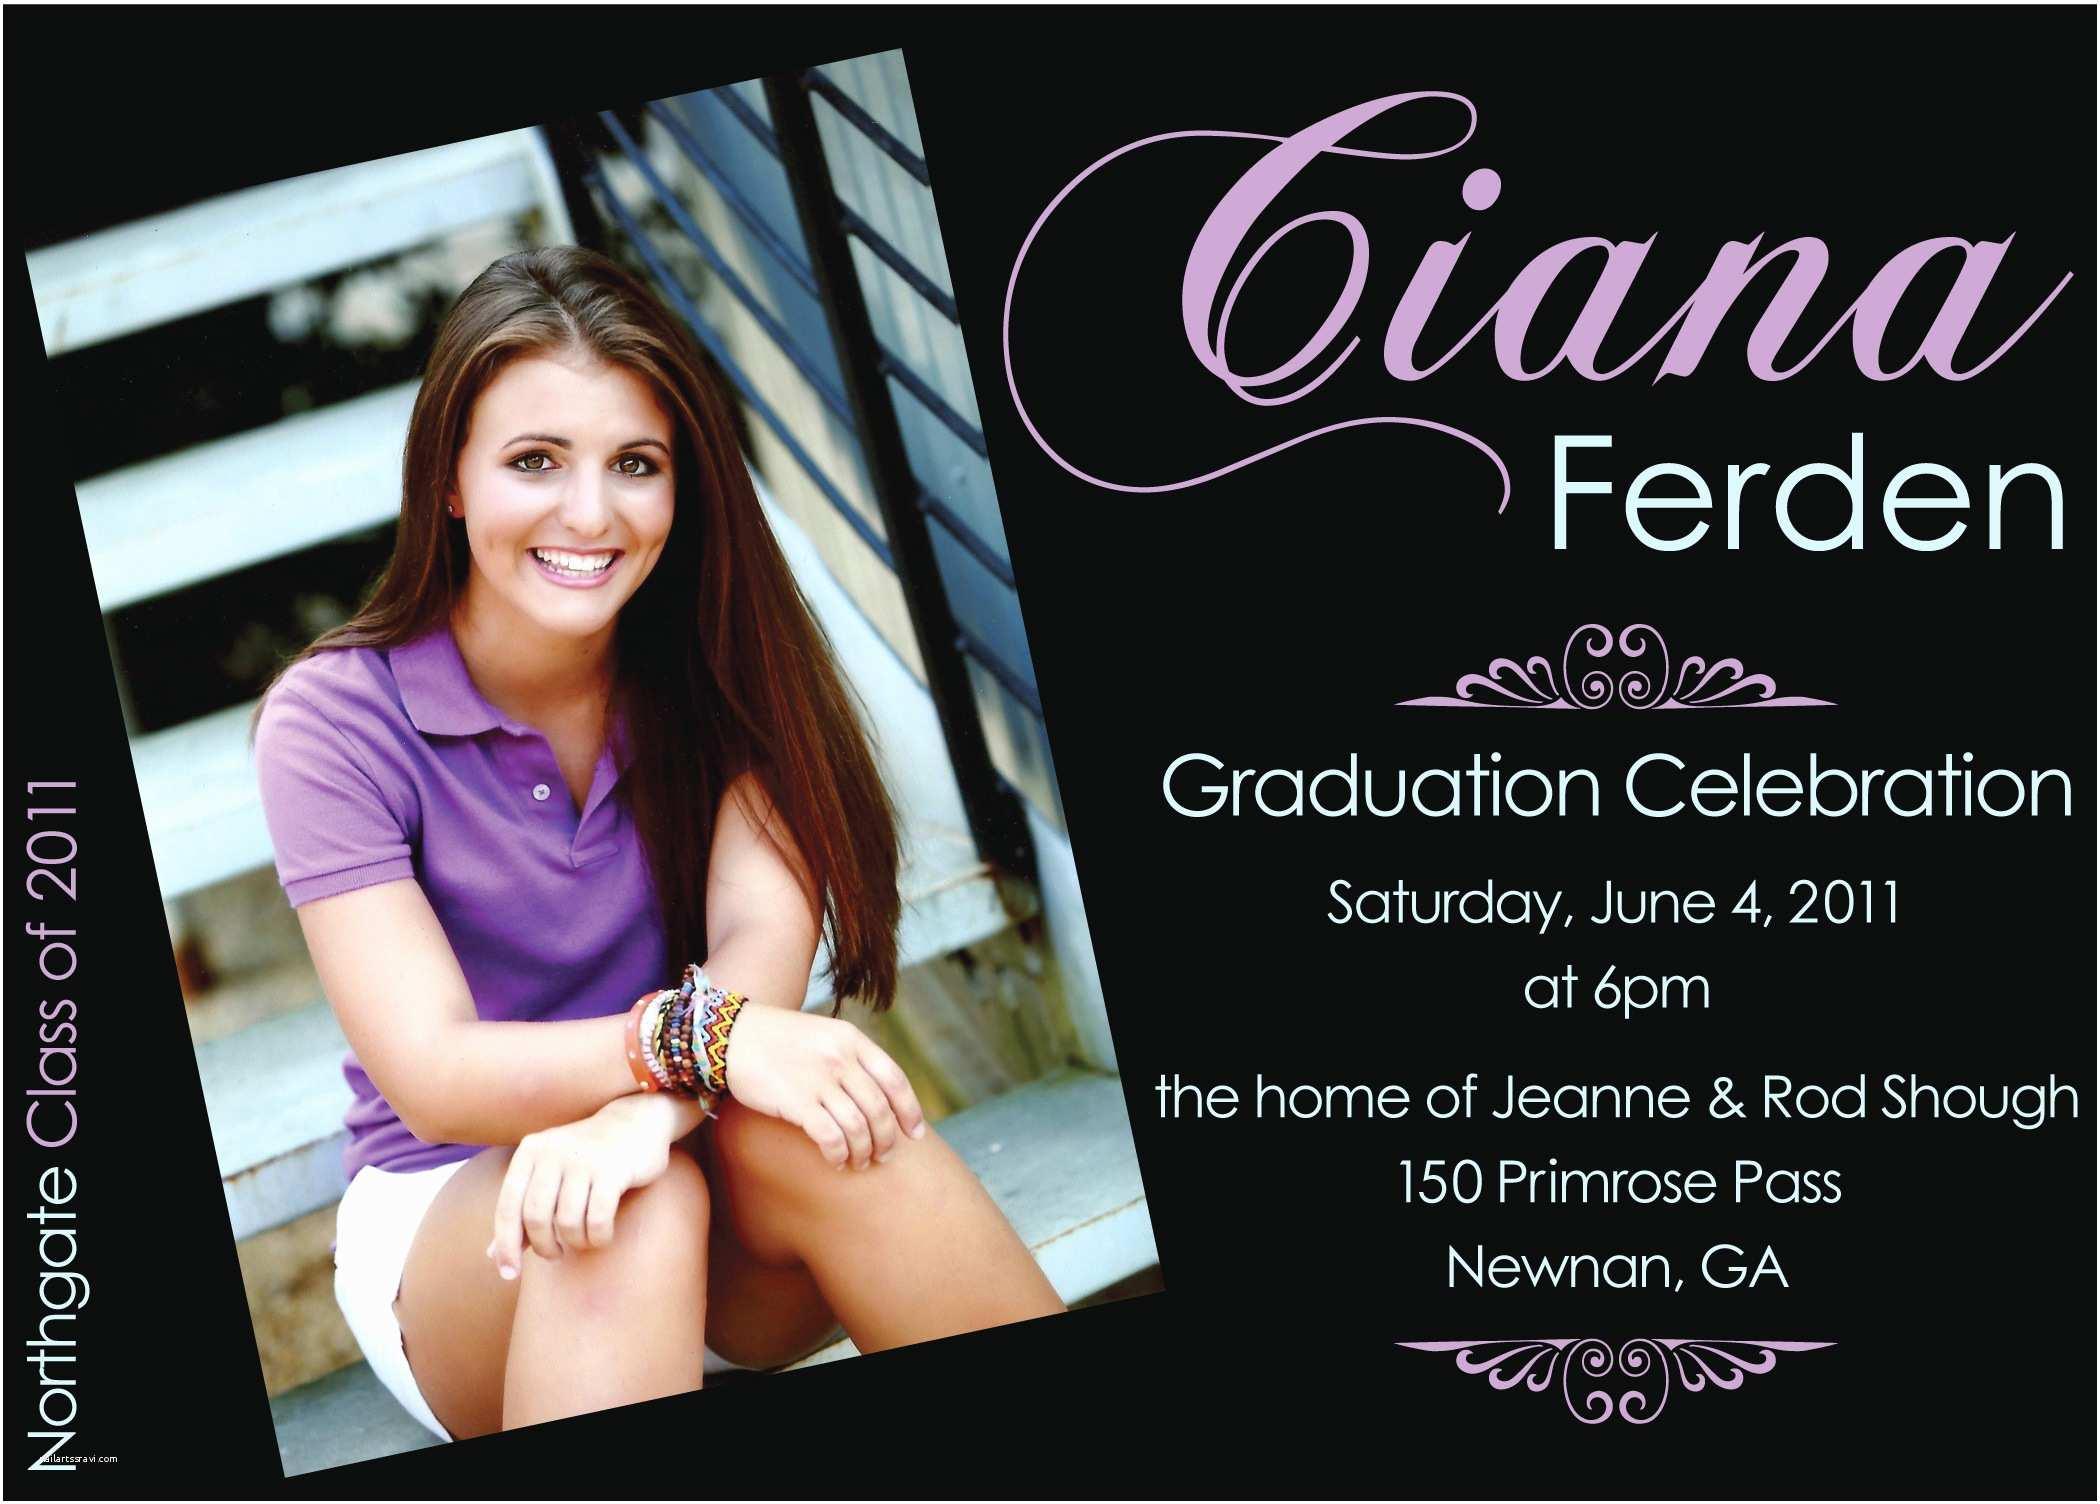 Graduation Party Invitation Templates Create Own Graduation Party Invitations Templates Free